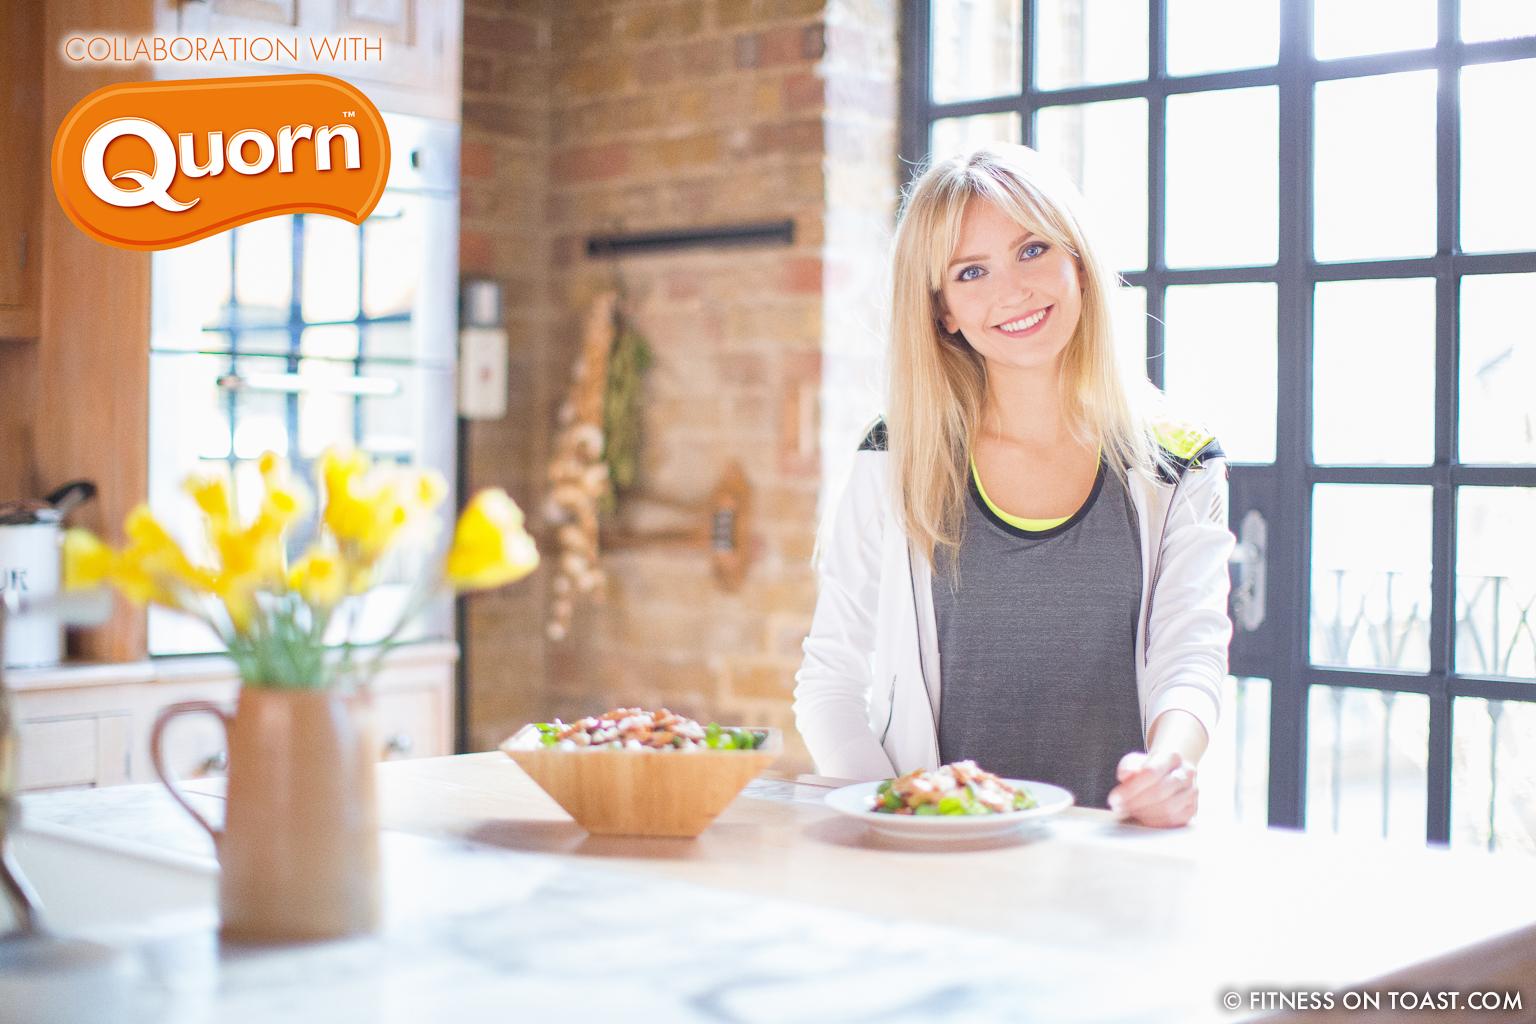 Fitness On Toast Faya Blog Girl Healthy Recipe Nutrition Quorn Protein Collaboration Fatoush Salad Main-21